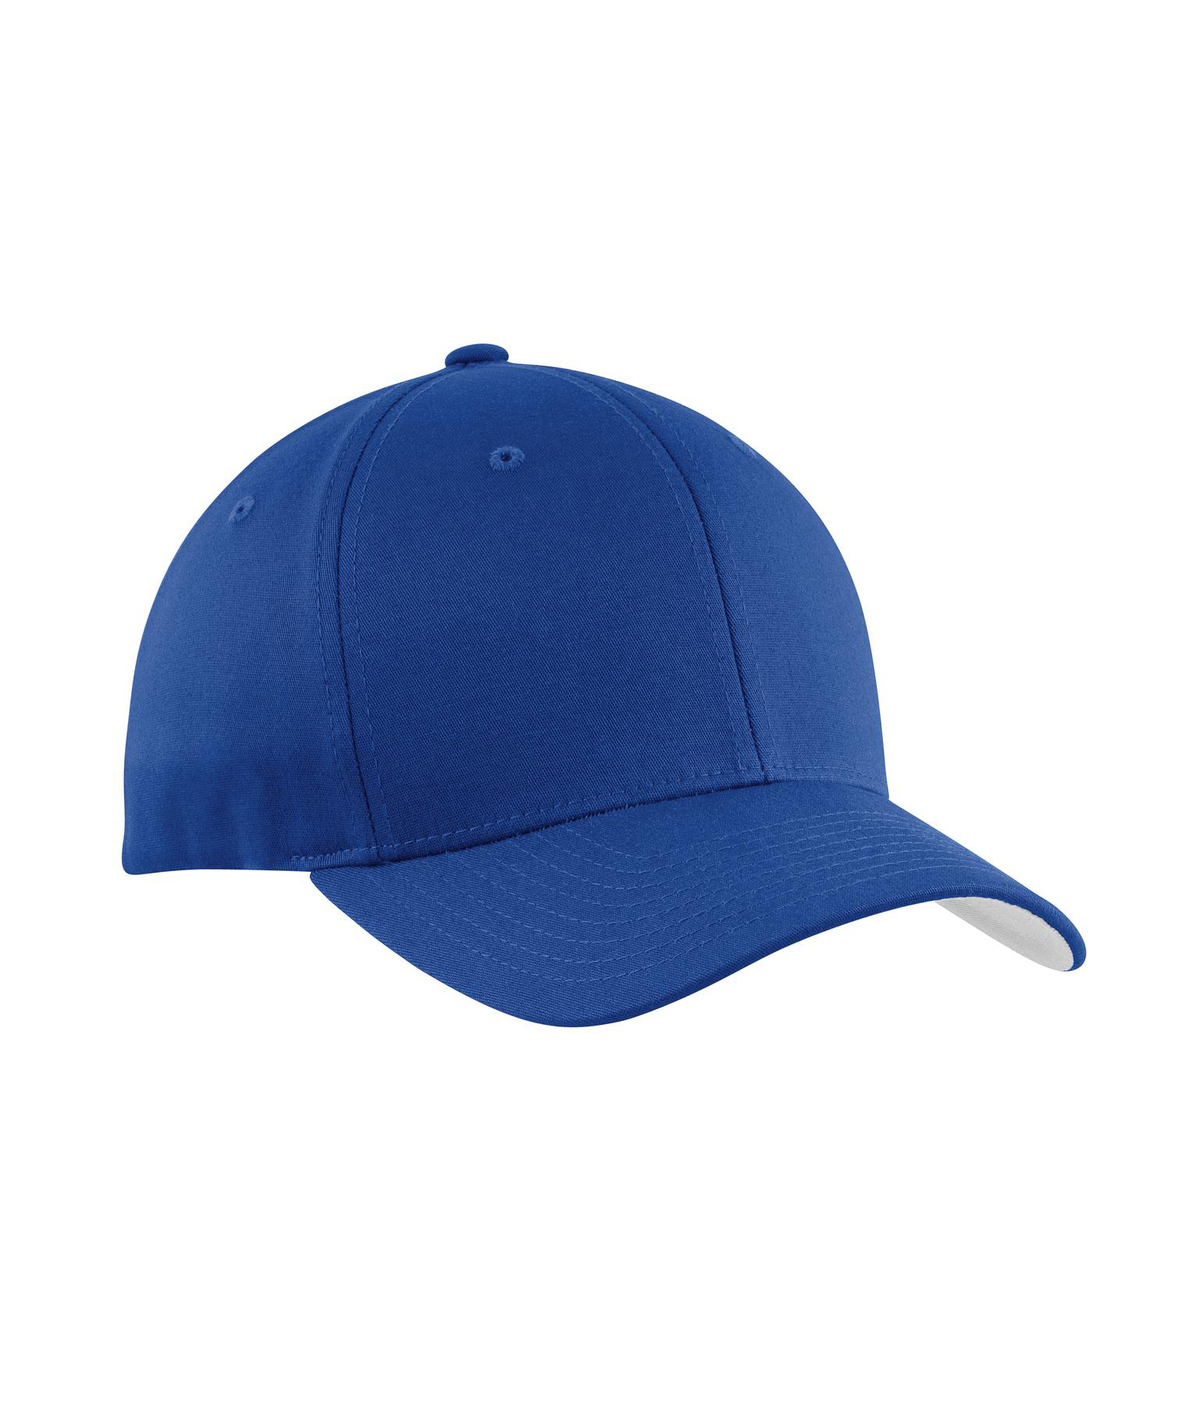 Port Authority® Flexfit® Cotton Twill Cap  e4e425e55a15